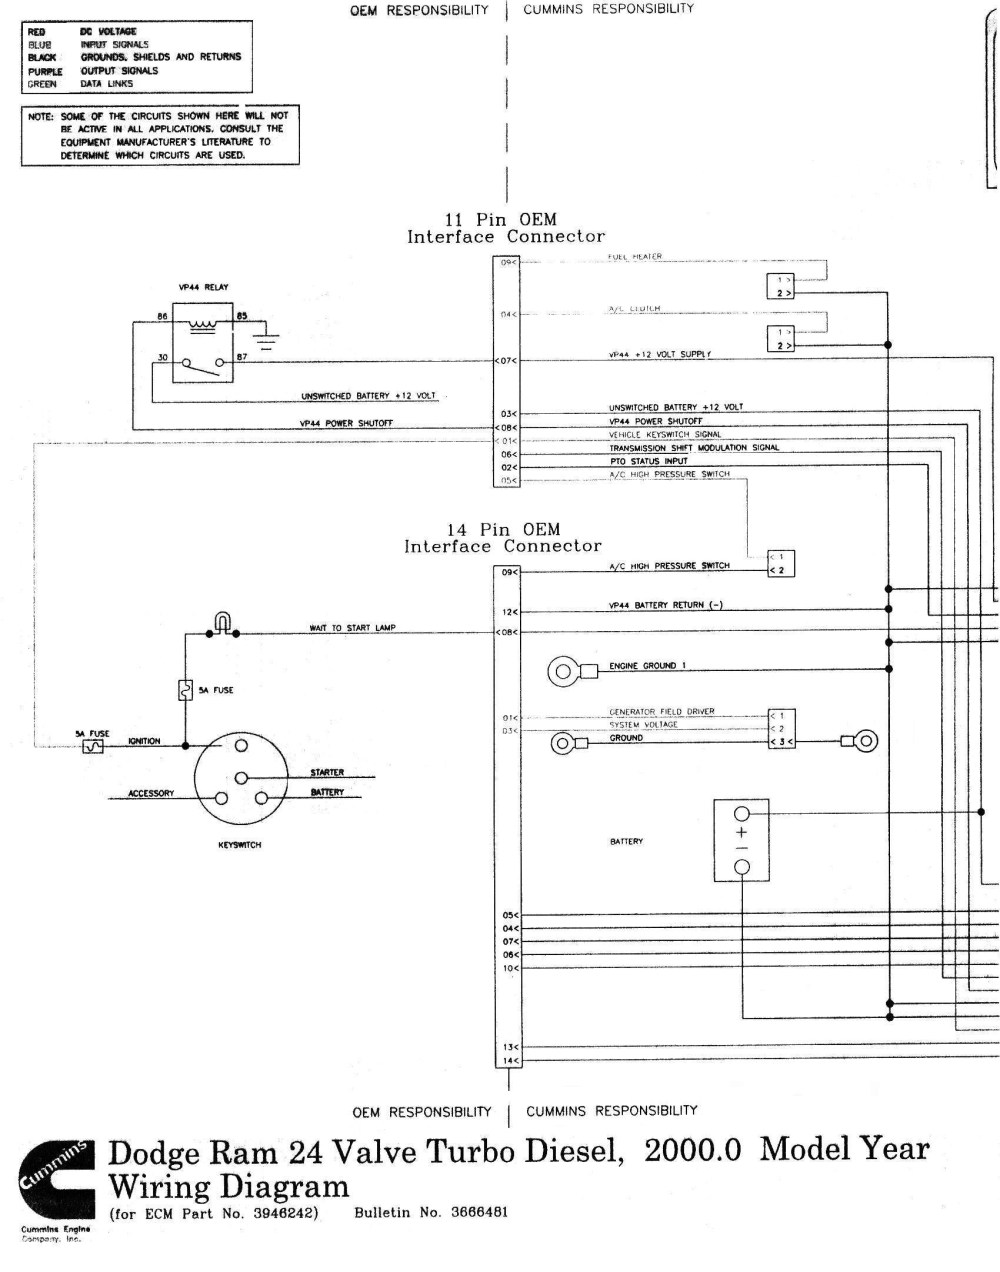 medium resolution of cummins diesel engine diagram dodge cummins diesel fuel line diagram dodge obd connector wiring of cummins